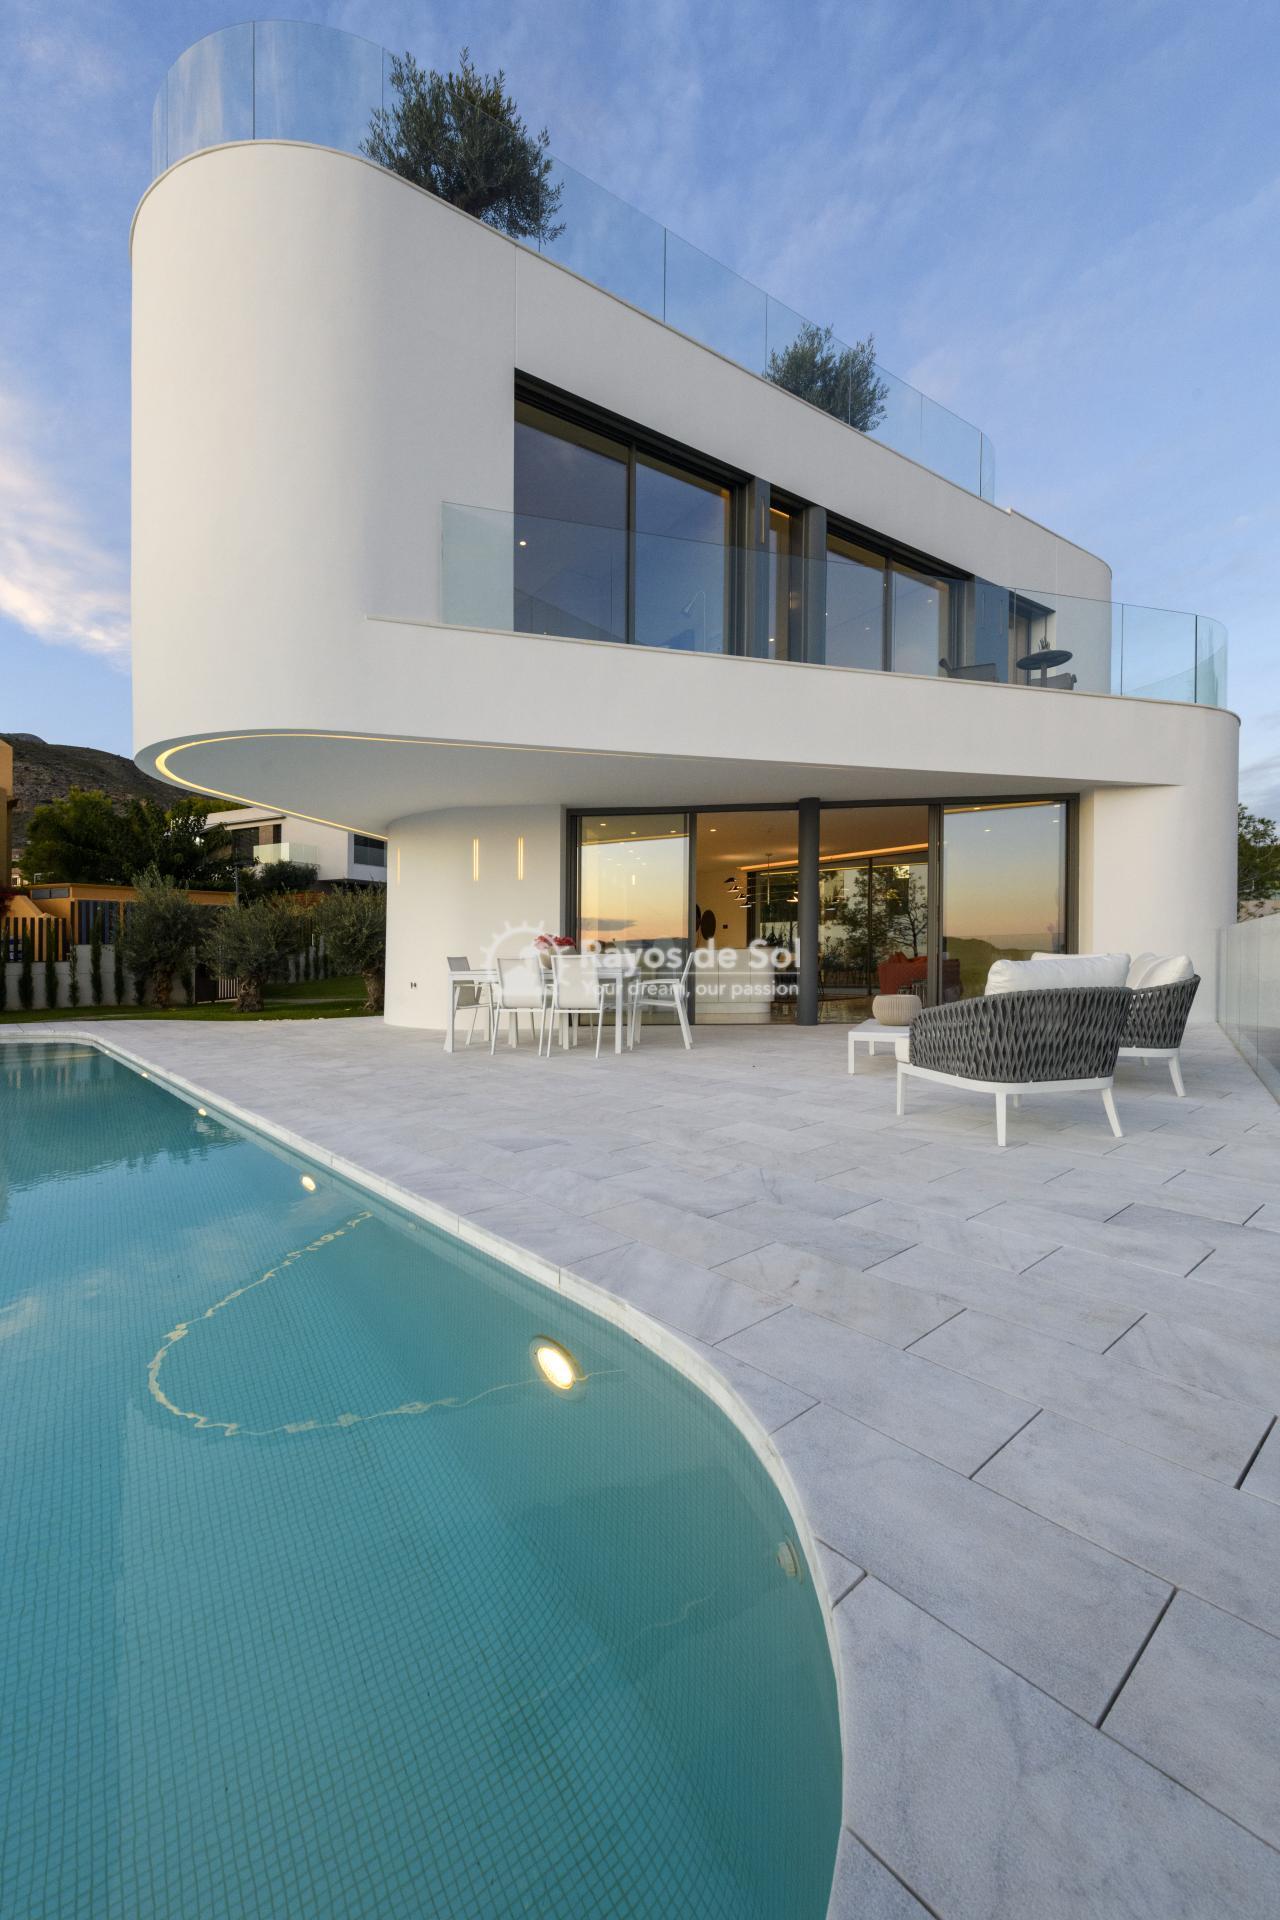 Stunning modern design villa  in Sierra Cortina, Finestrat, Costa Blanca (Praga 19) - 84